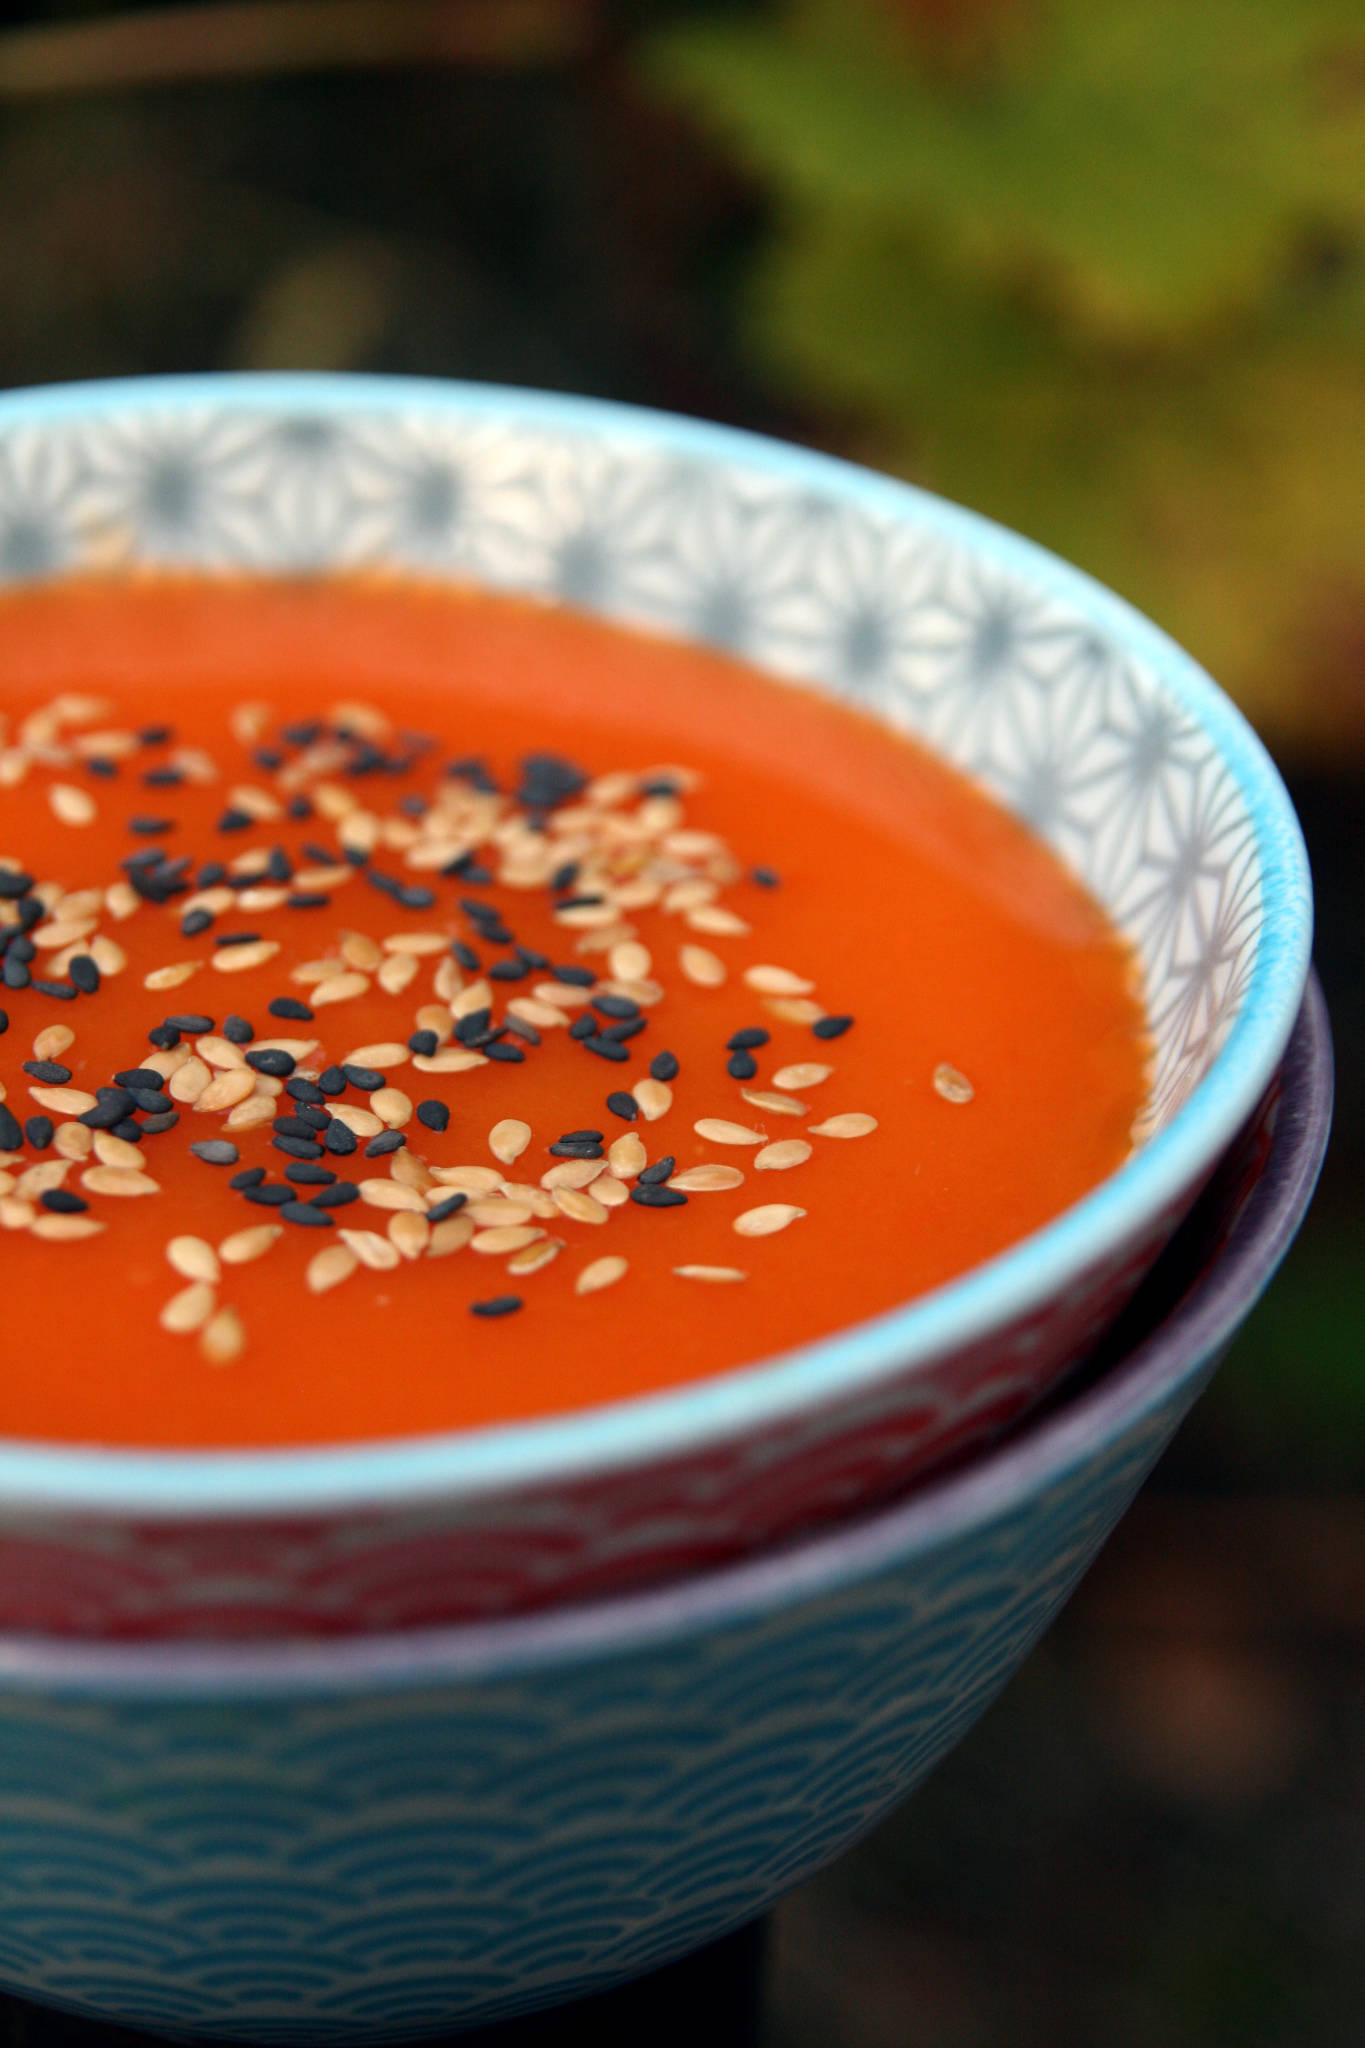 Top carotte gingembre site de rencontre